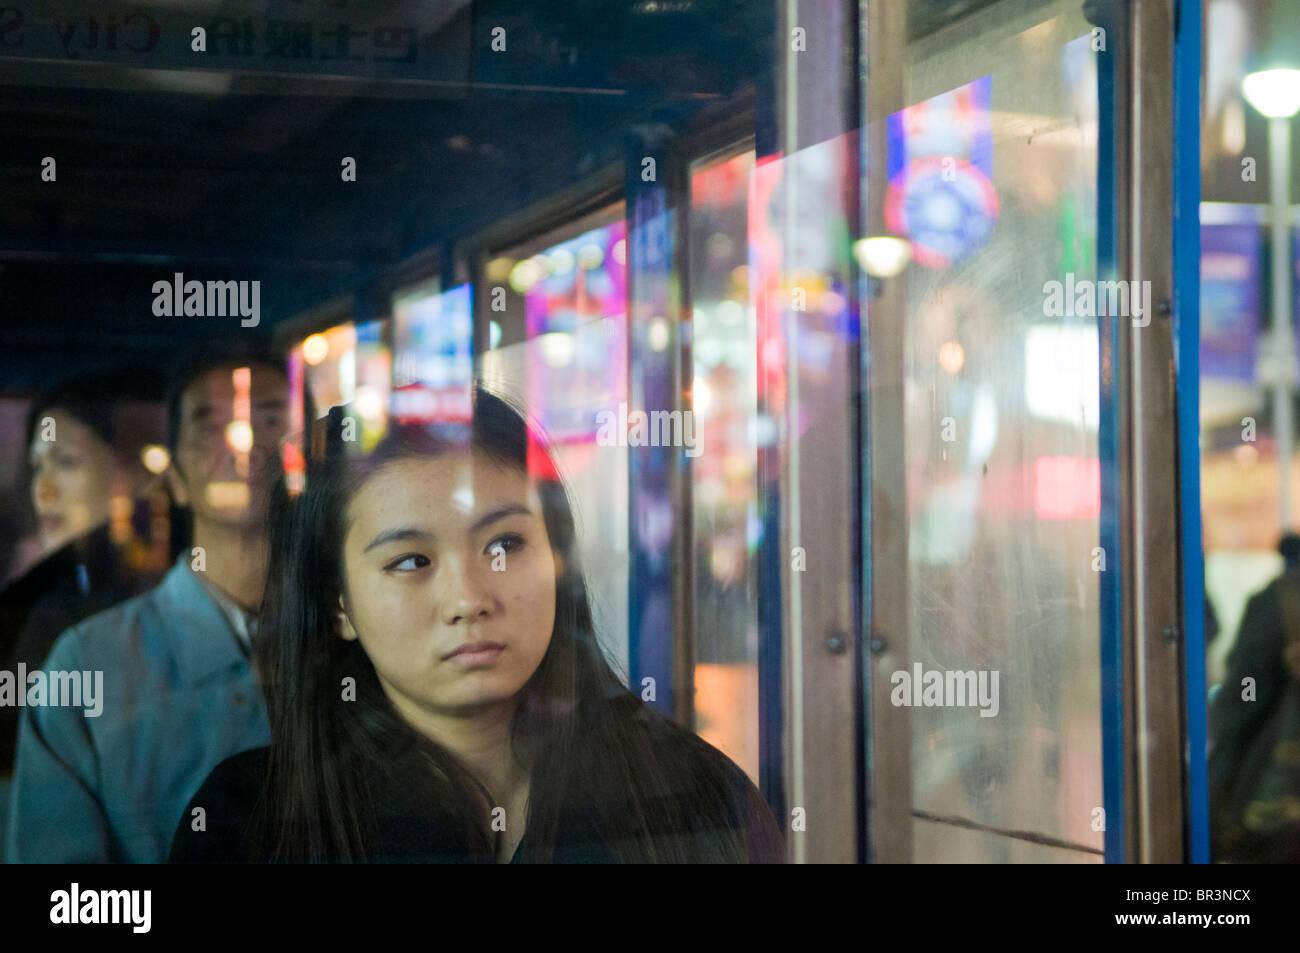 Joven, paseos en tranvía, la calle peatonal de Nanjing, Shanghai, China Imagen De Stock